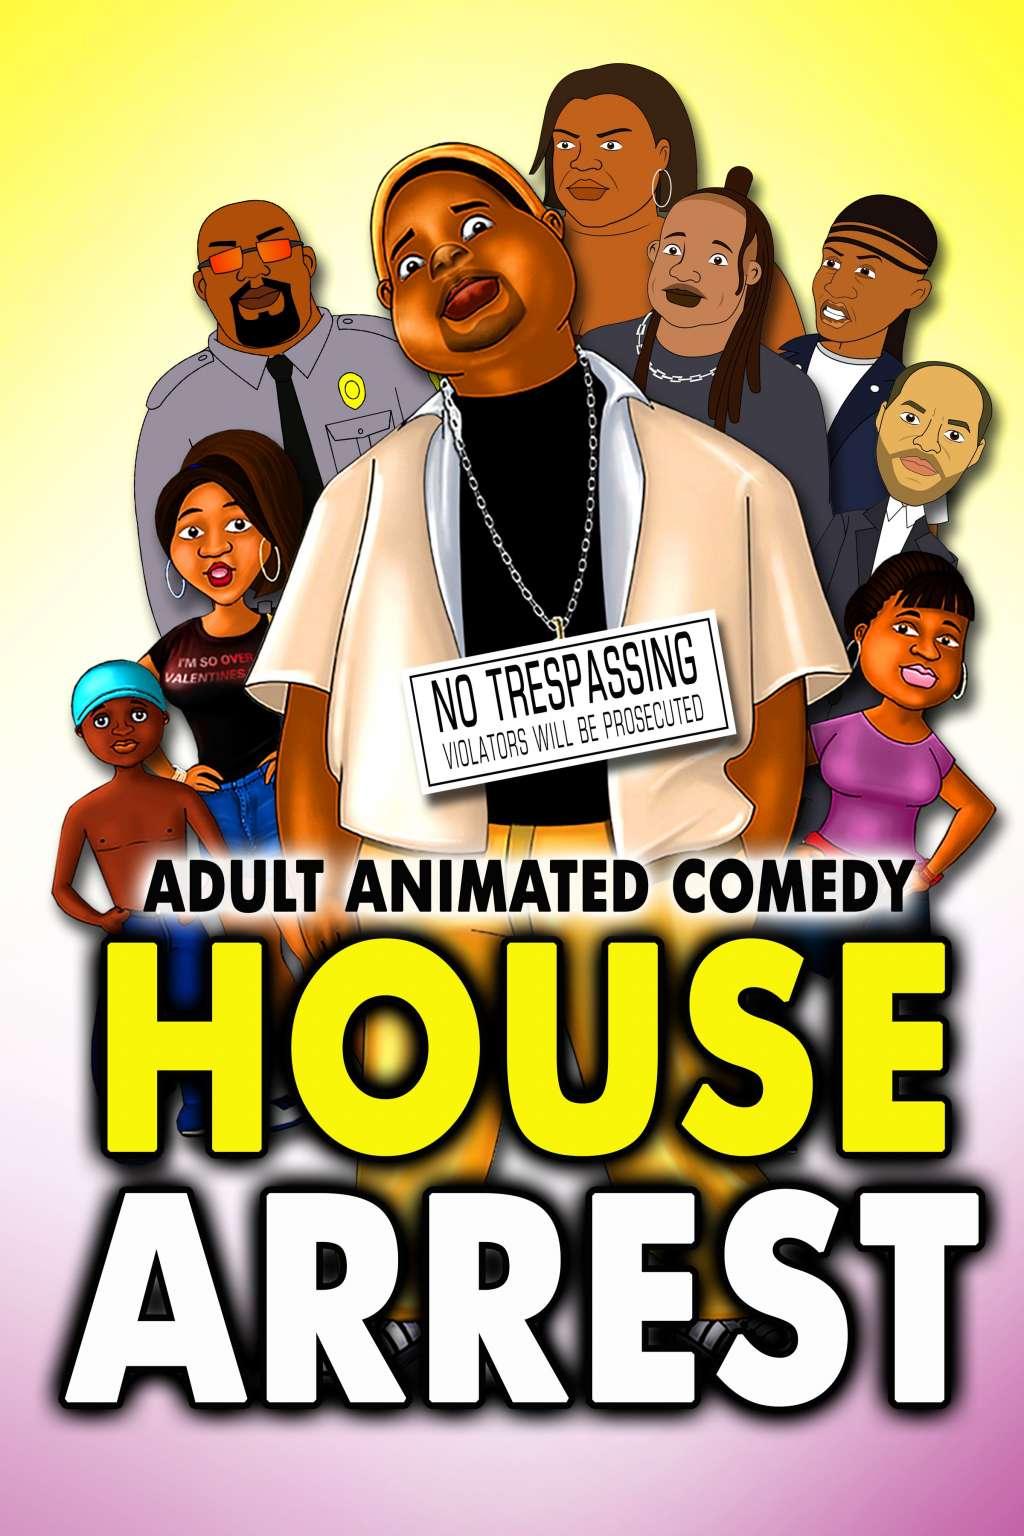 House Arrest kapak